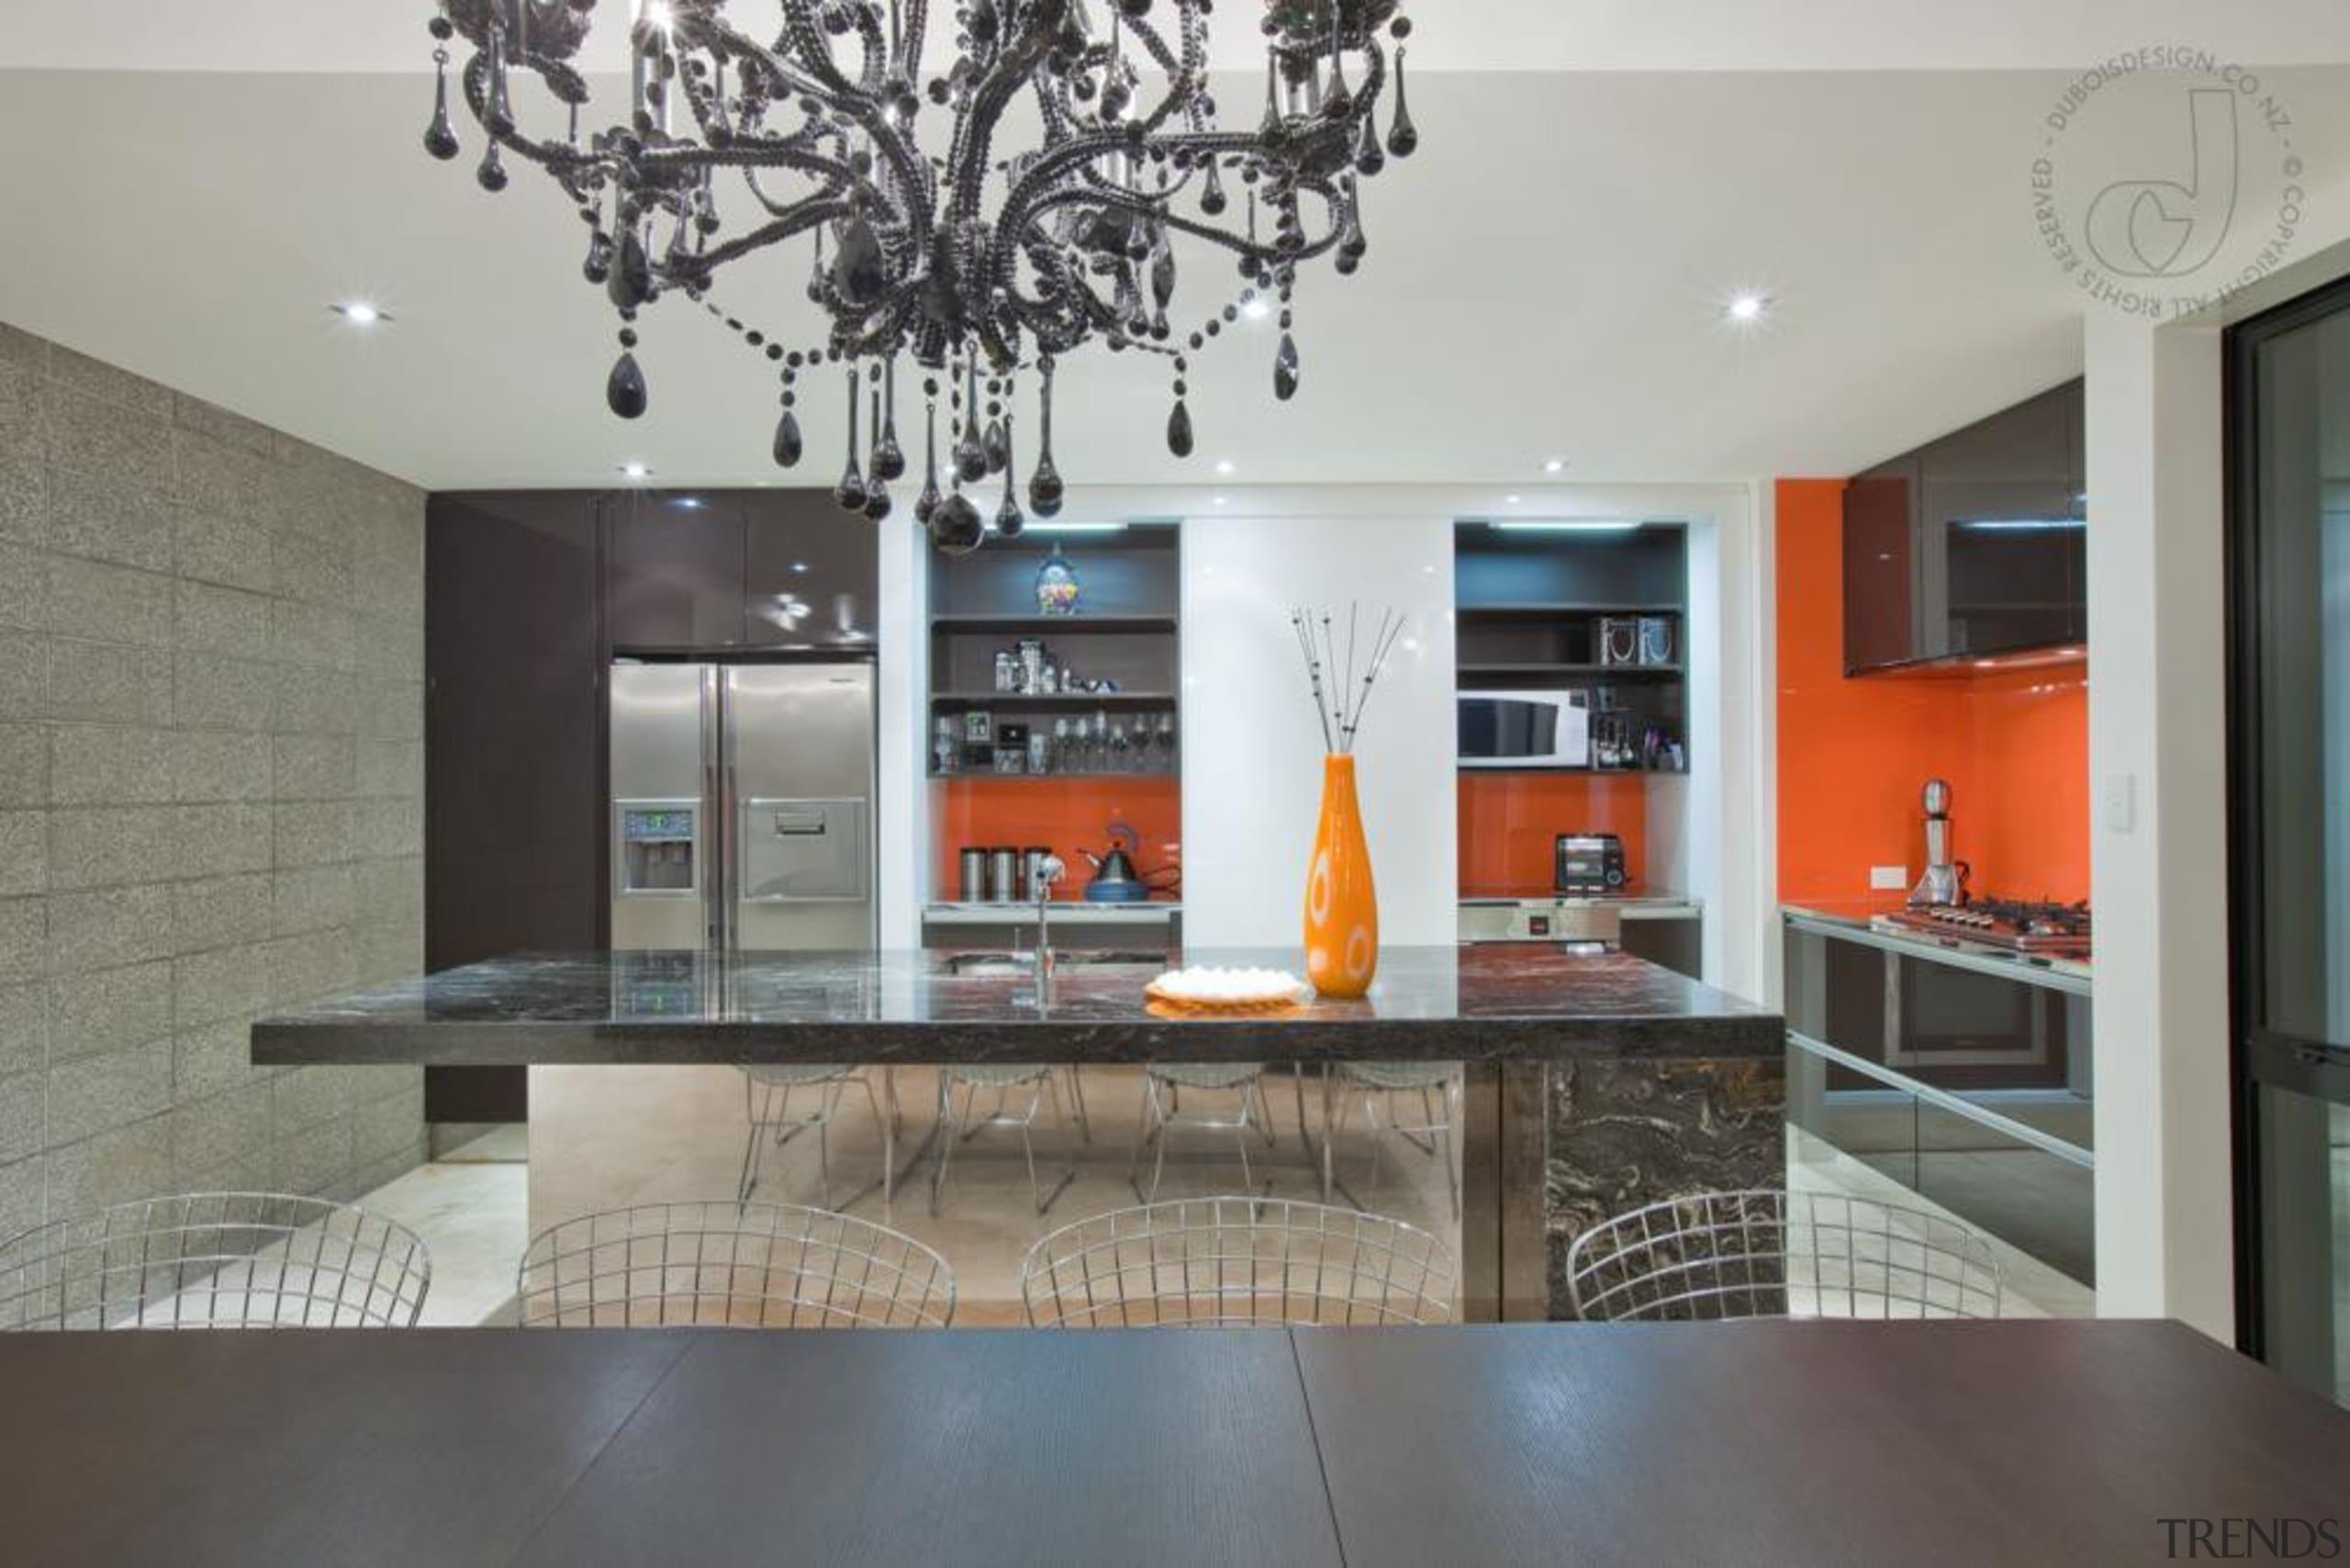 Sliding doors hide a sleek steel benchtop with countertop, interior design, interior designer, kitchen, living room, property, real estate, gray